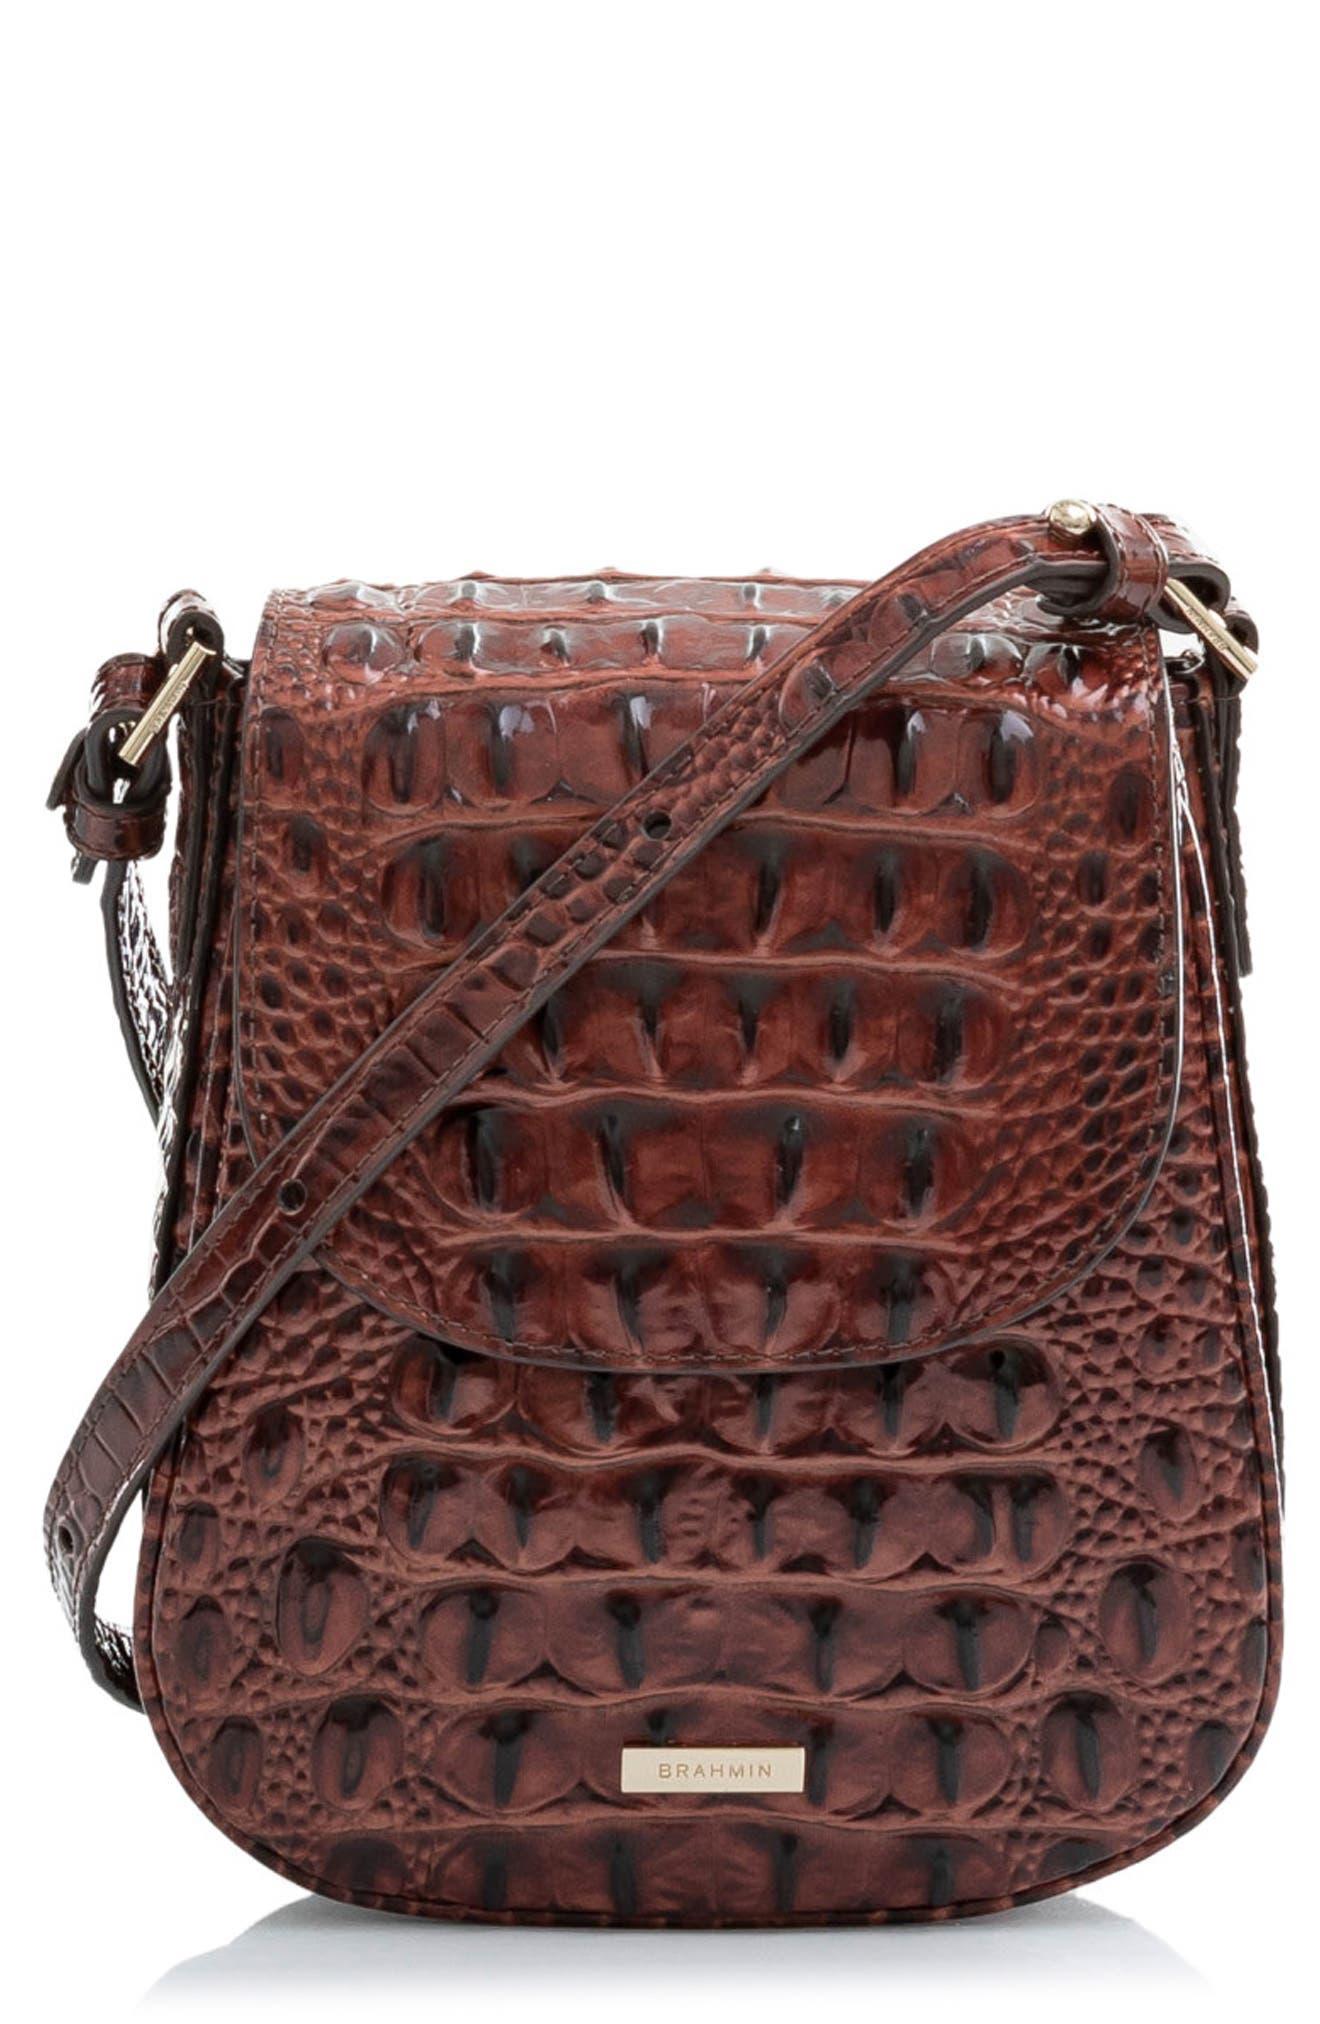 Everlee Croc Embossed Leather Crossbody Bag